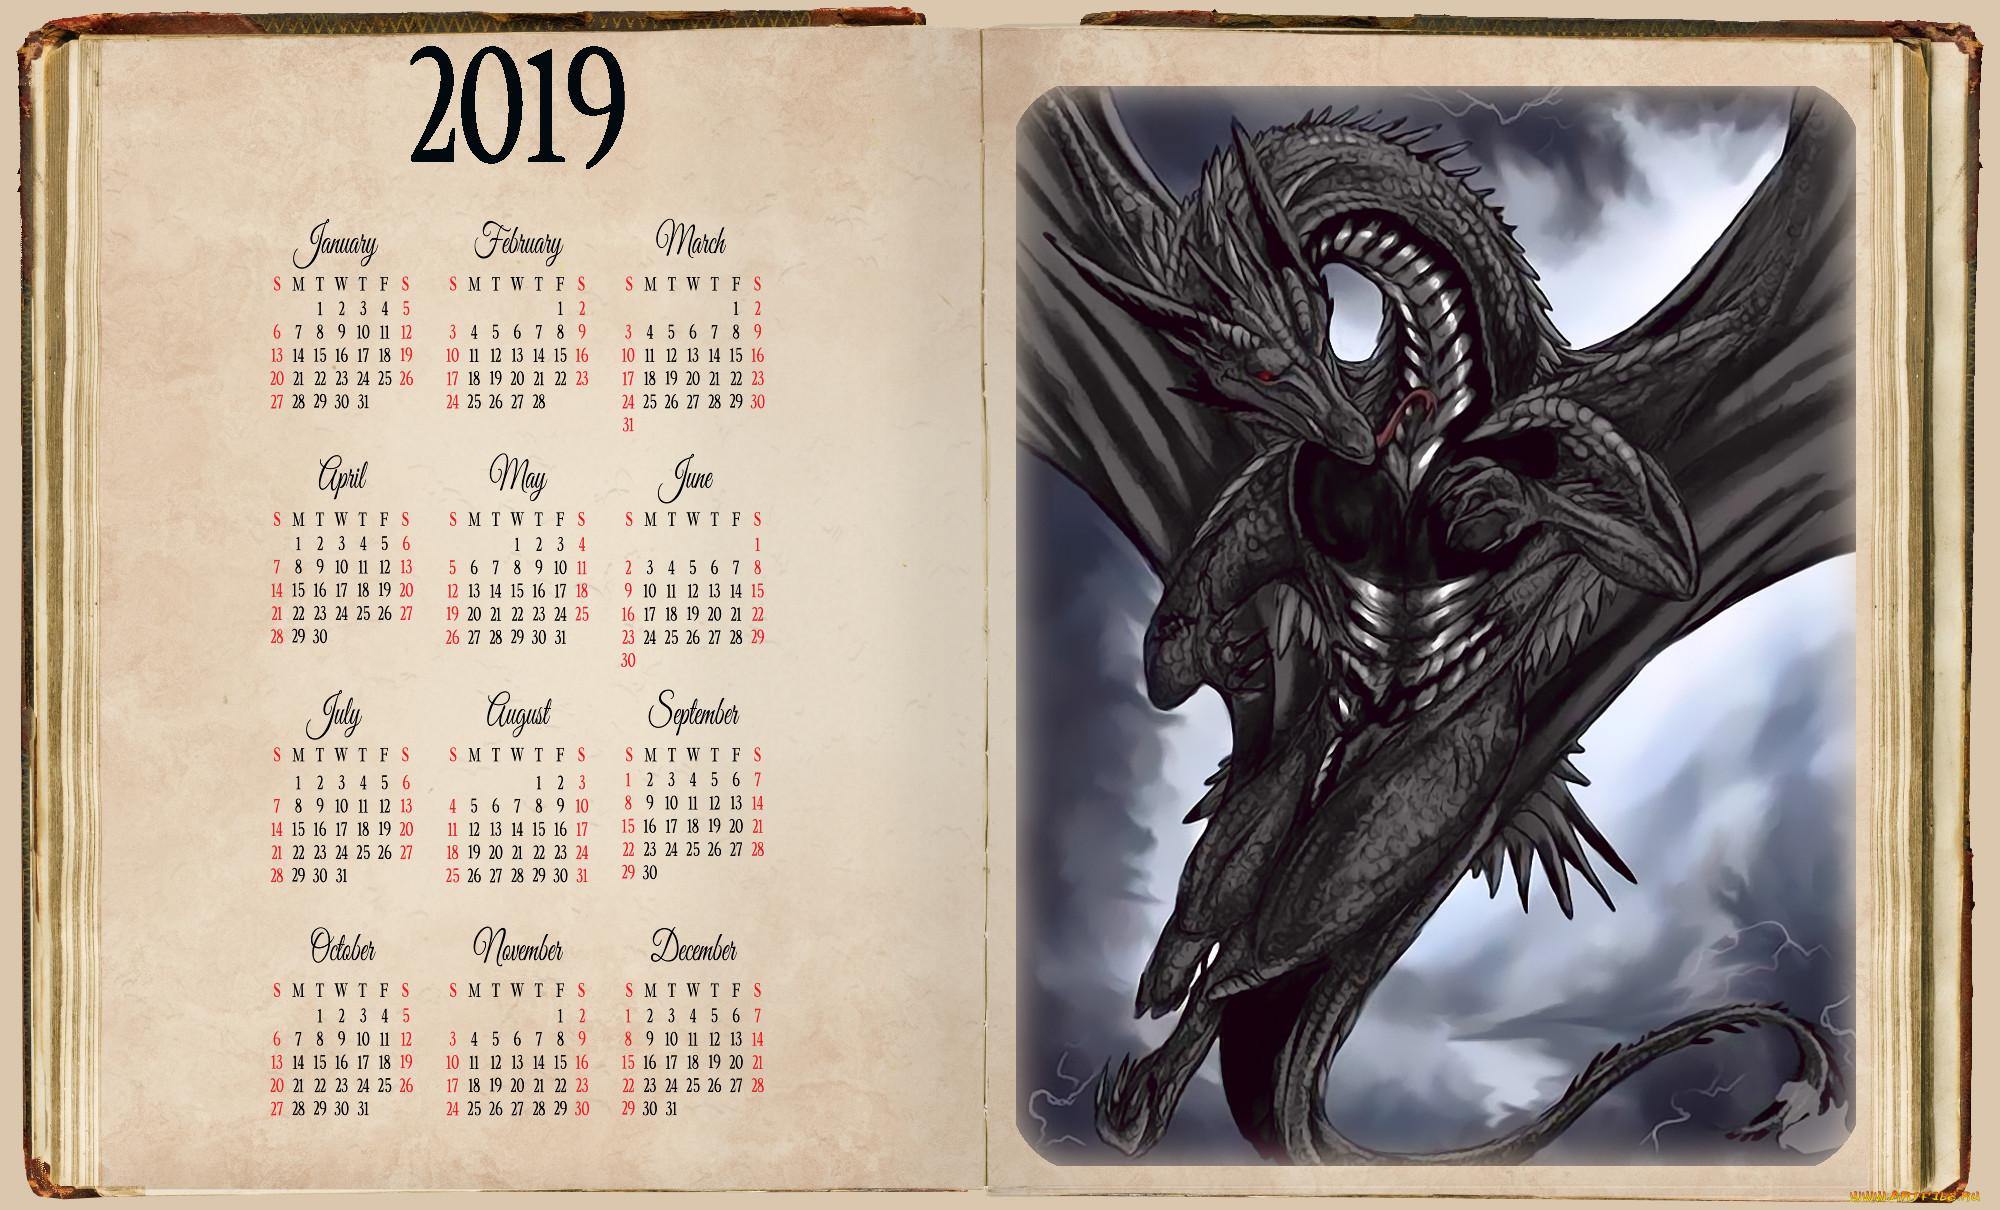 картинки для календаря дракон магазин пива сидра